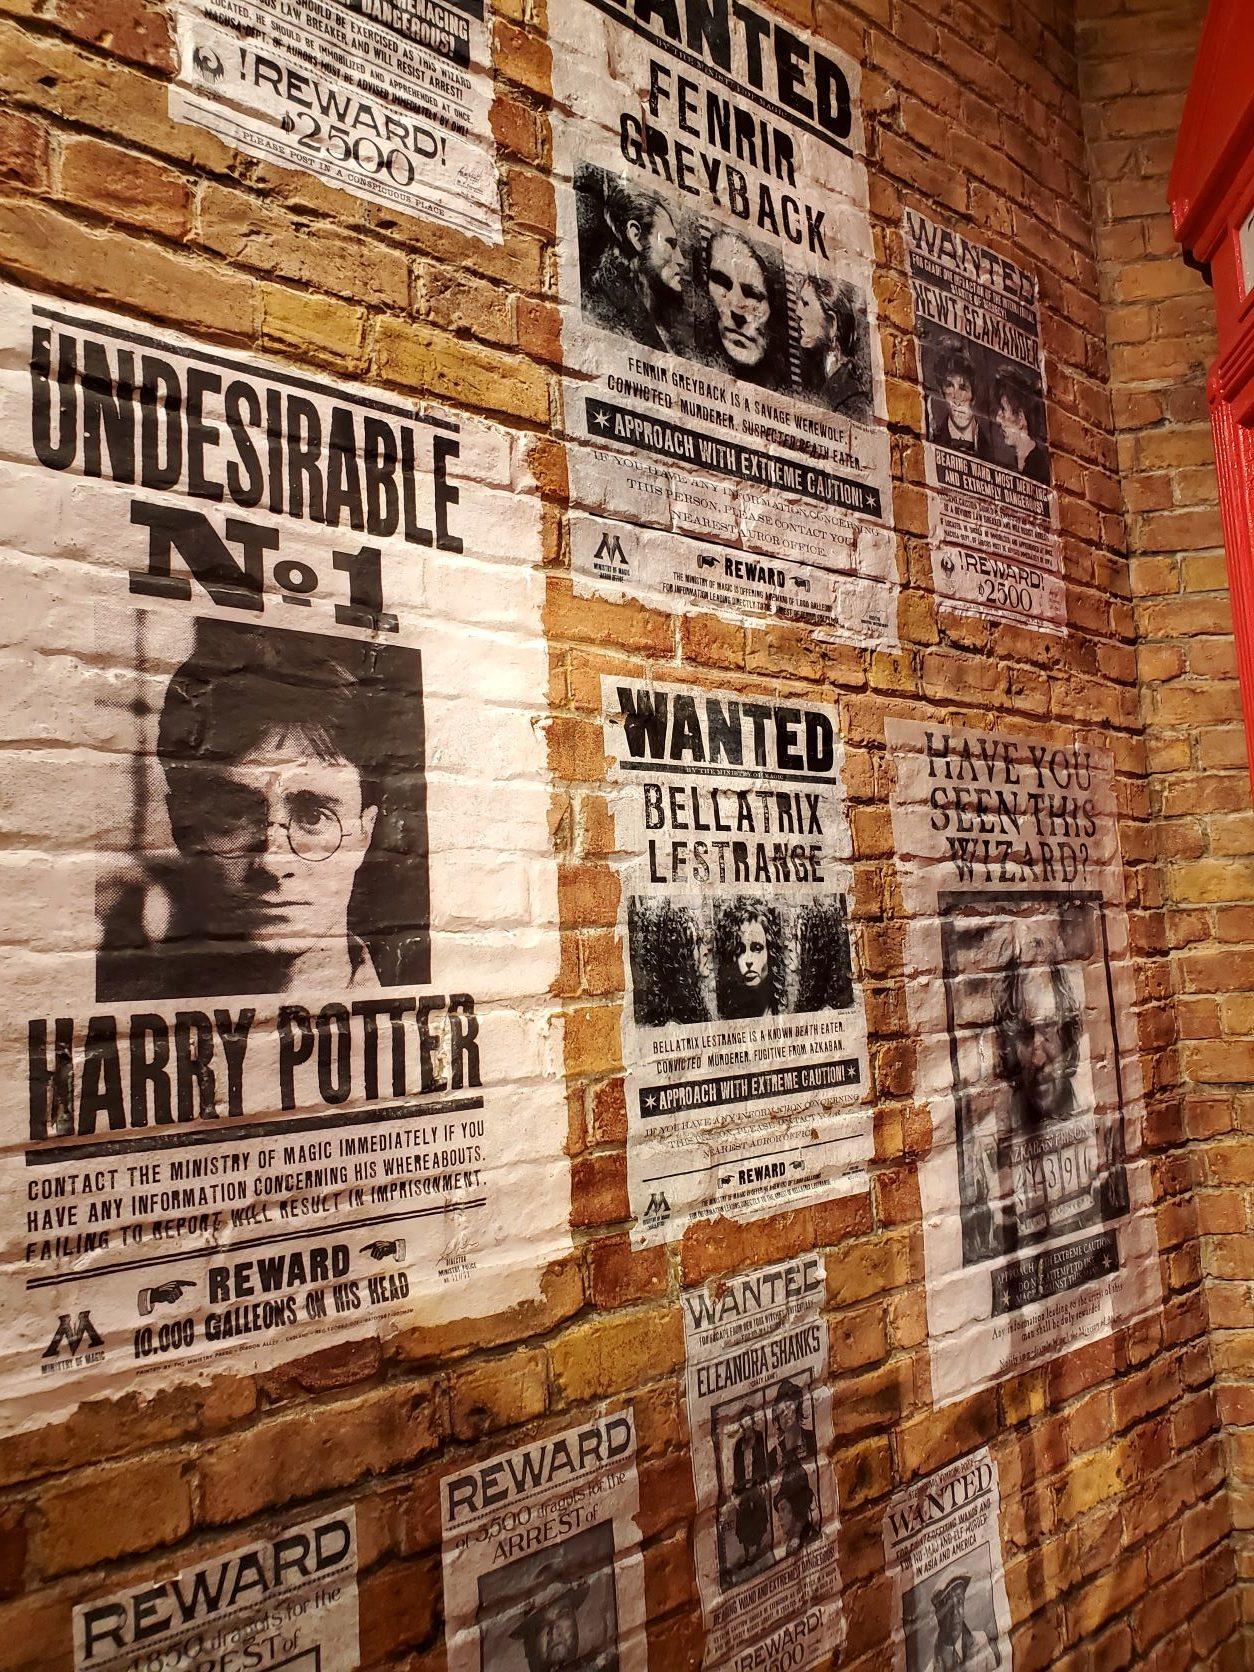 Harry Potter New York